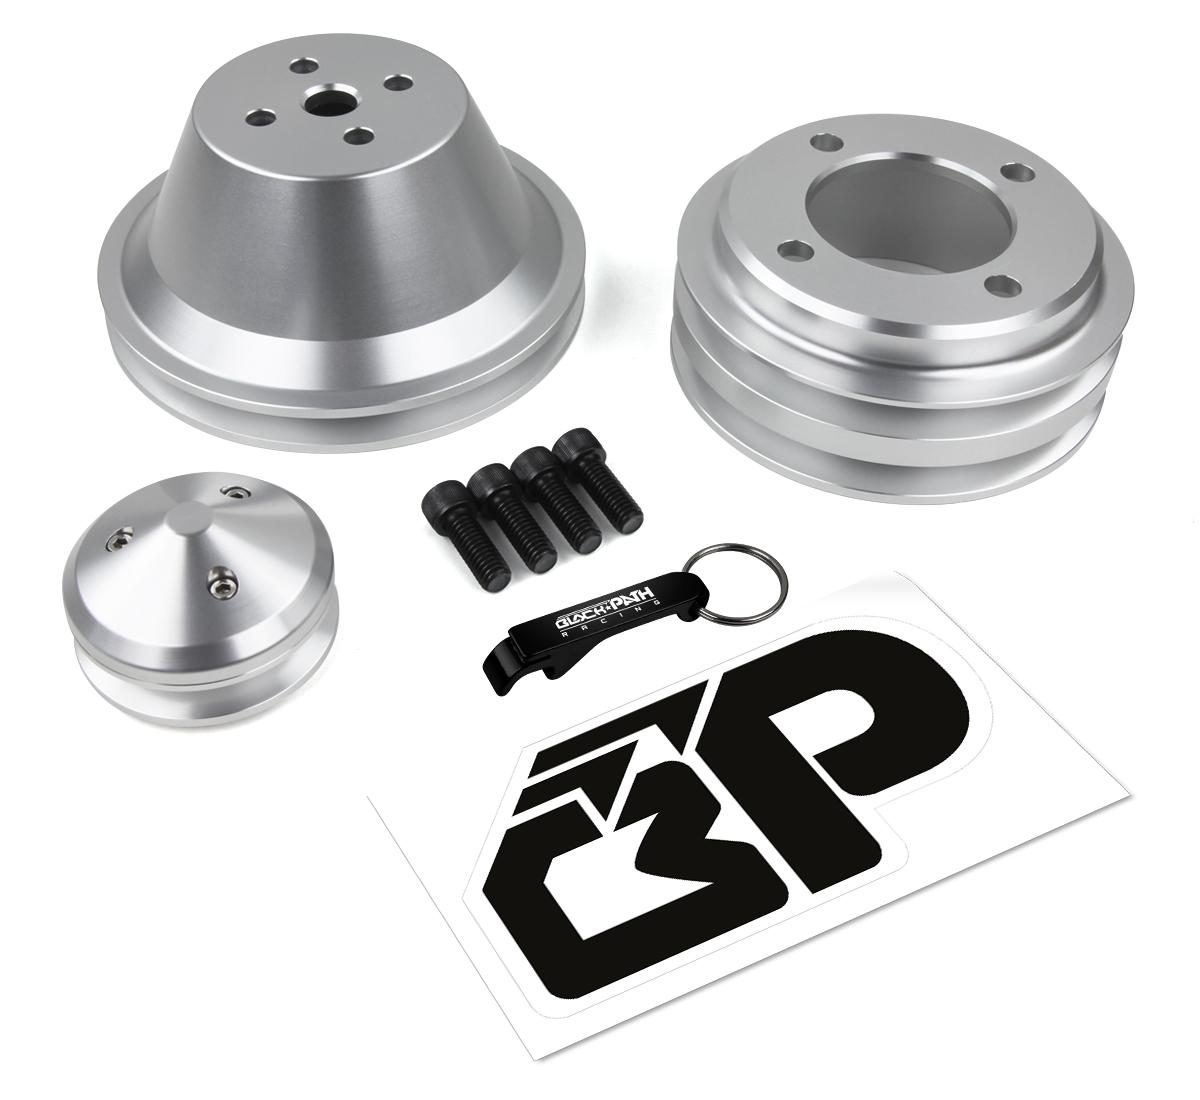 Ford V-Belt Pulley Kit 302 351W 351C 351M 400 Alternator